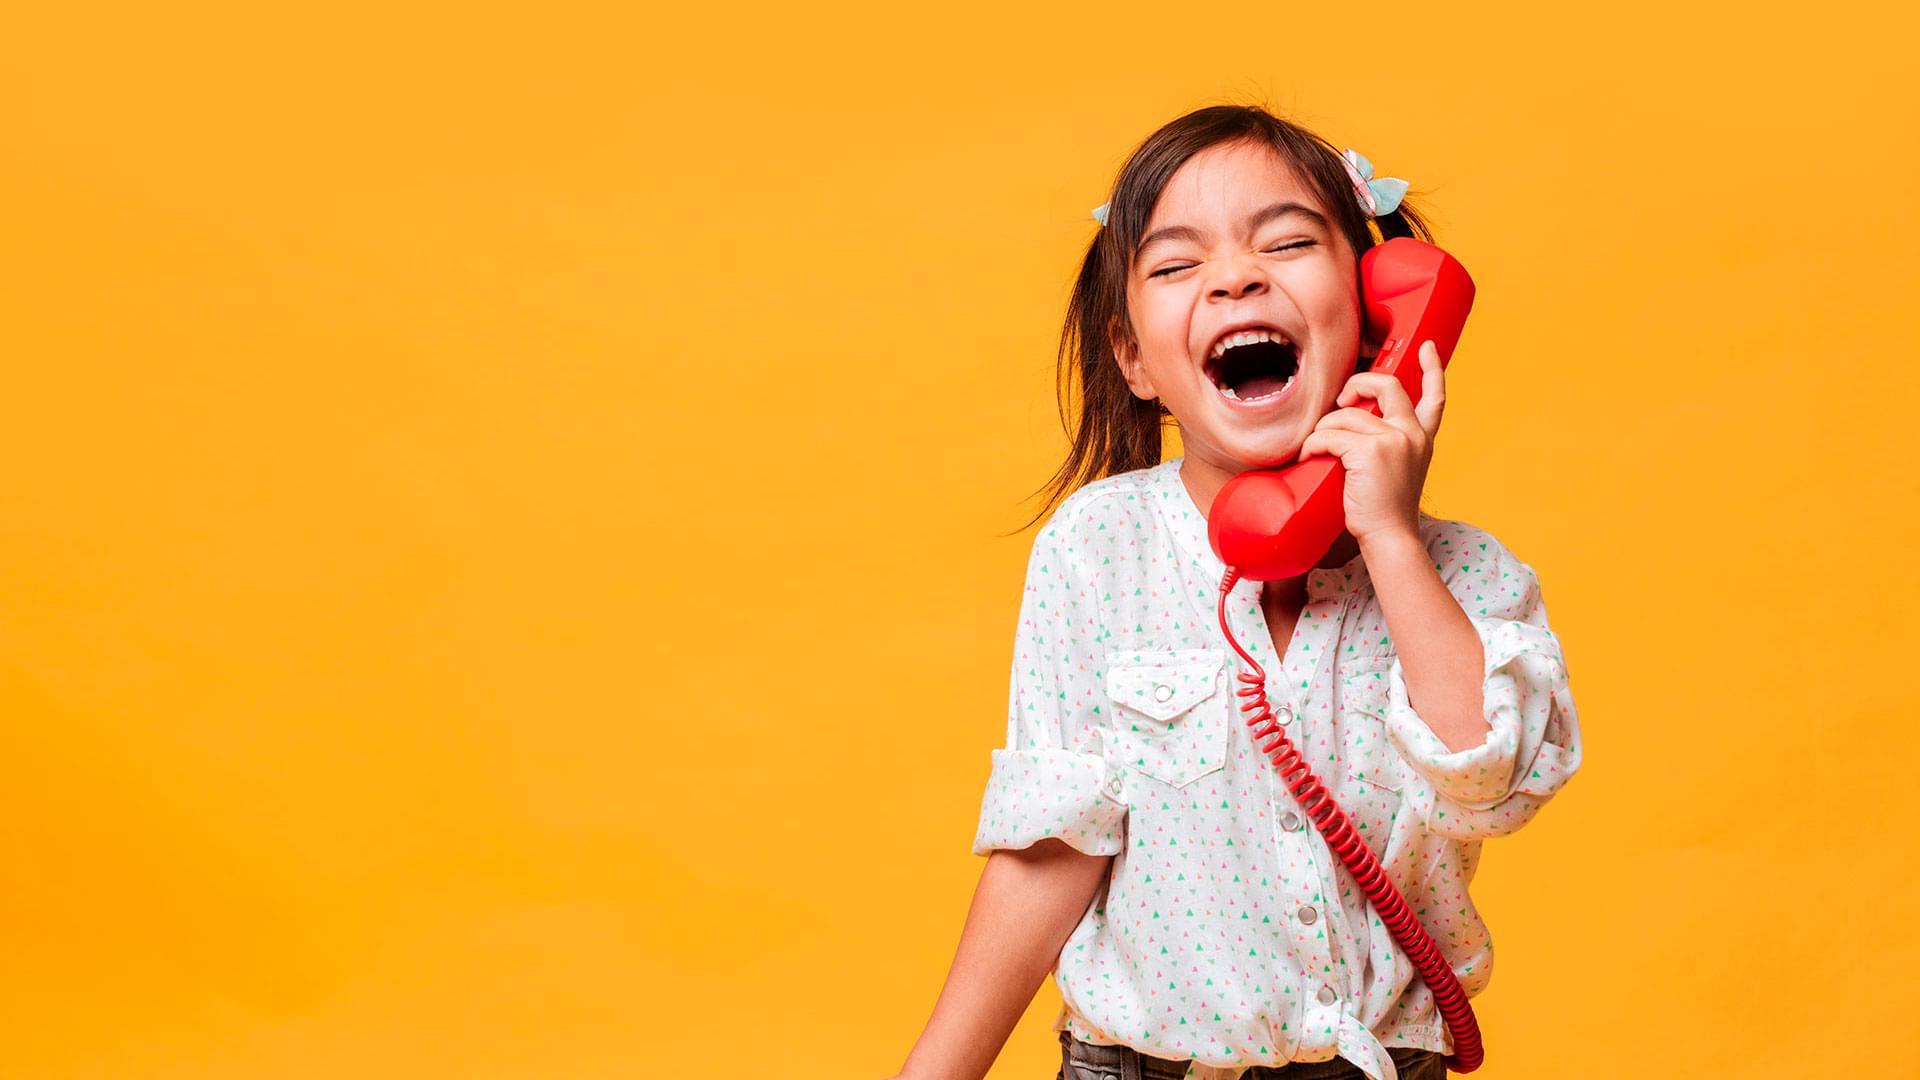 BESPLATAN PRENOS<br>TELEFONSKOG BROJA